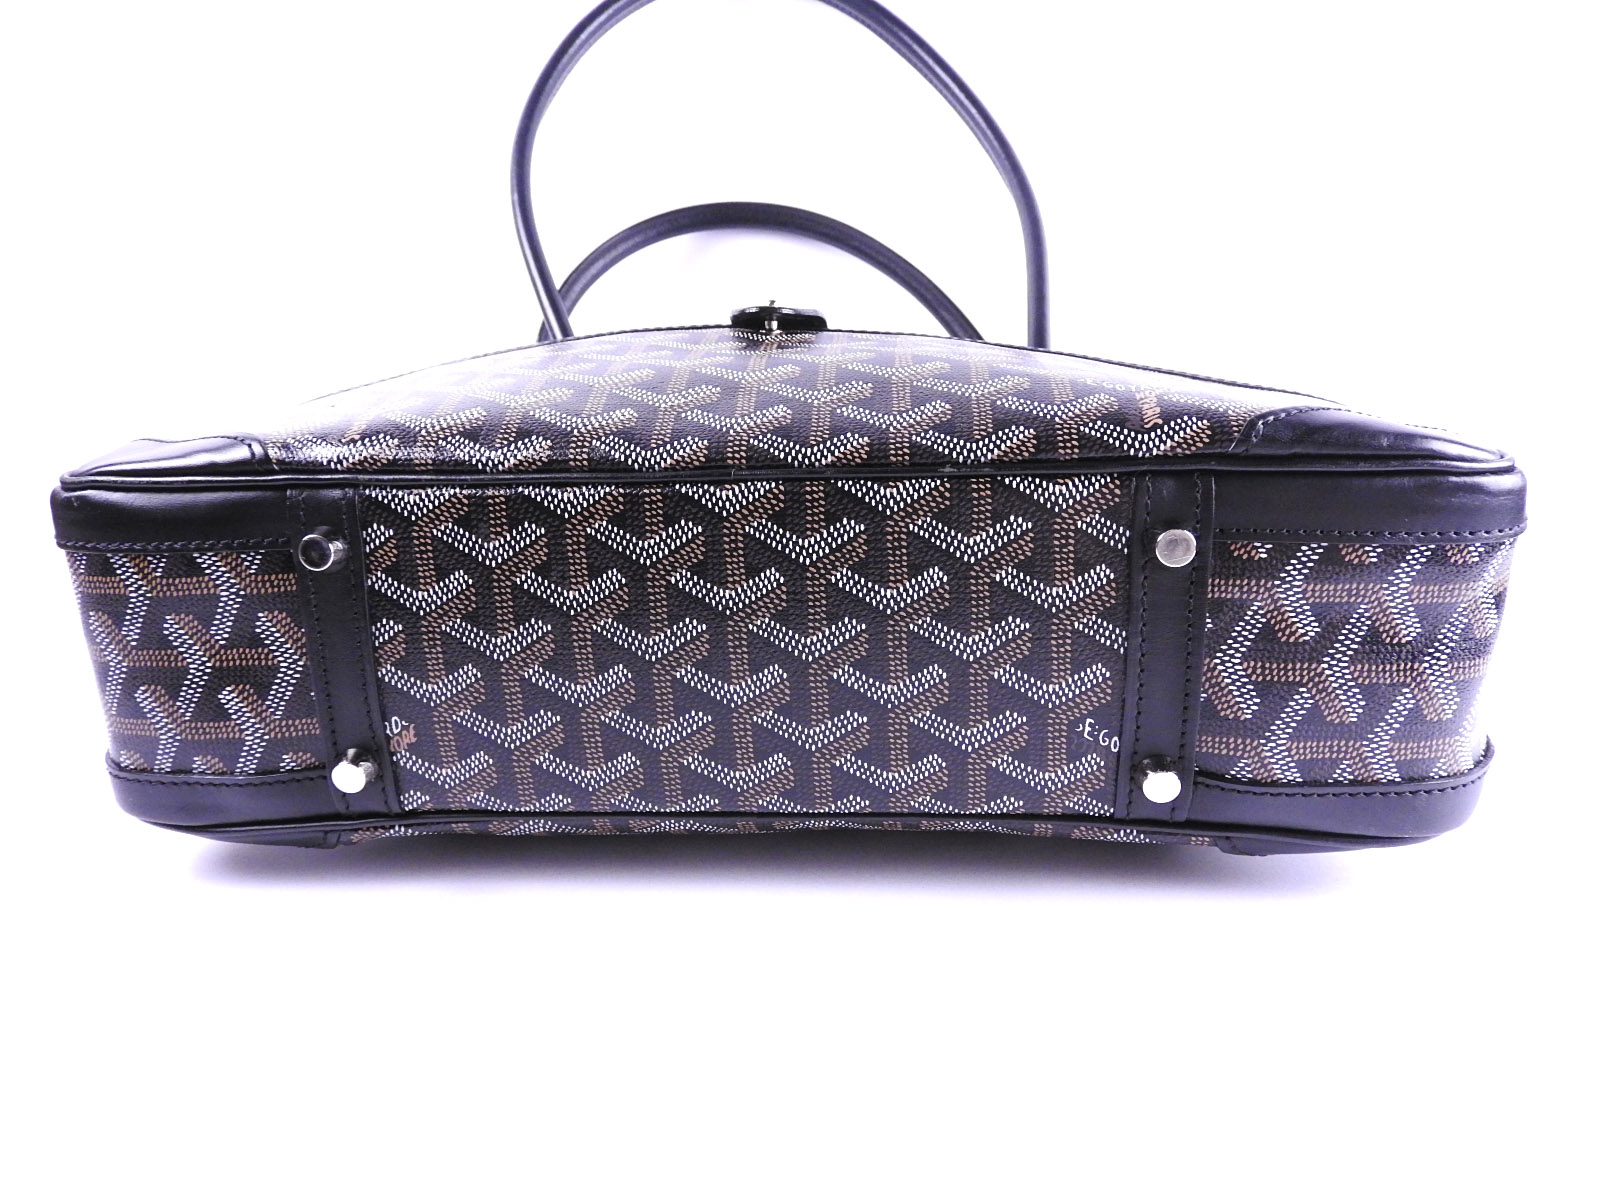 c35339e95f GOYARD Saint Martin Mini Boston Bag Shoulder Hand Bag PVC Leather ...